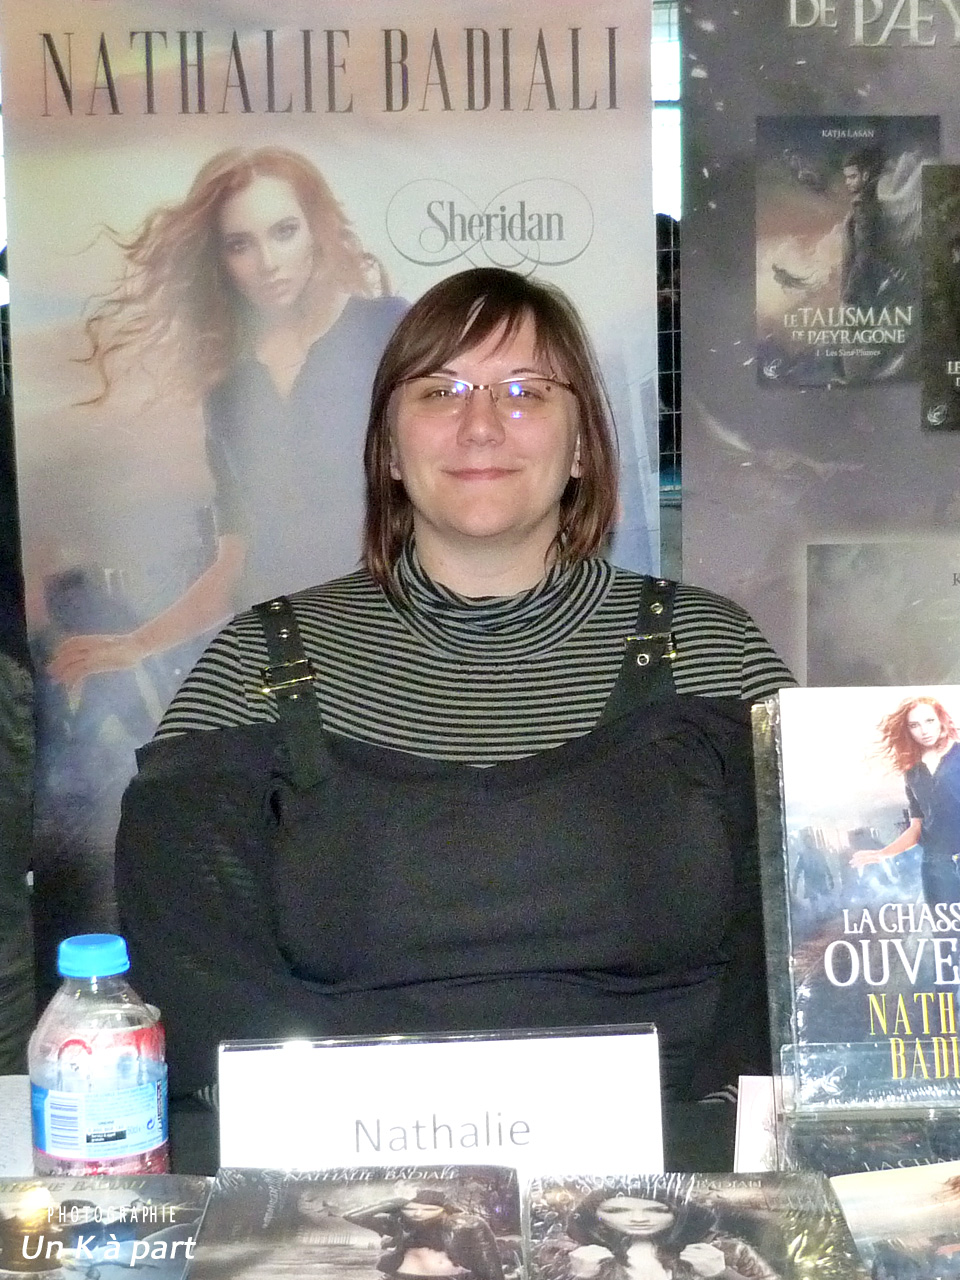 Festival livre romantique Nathalie Badiali